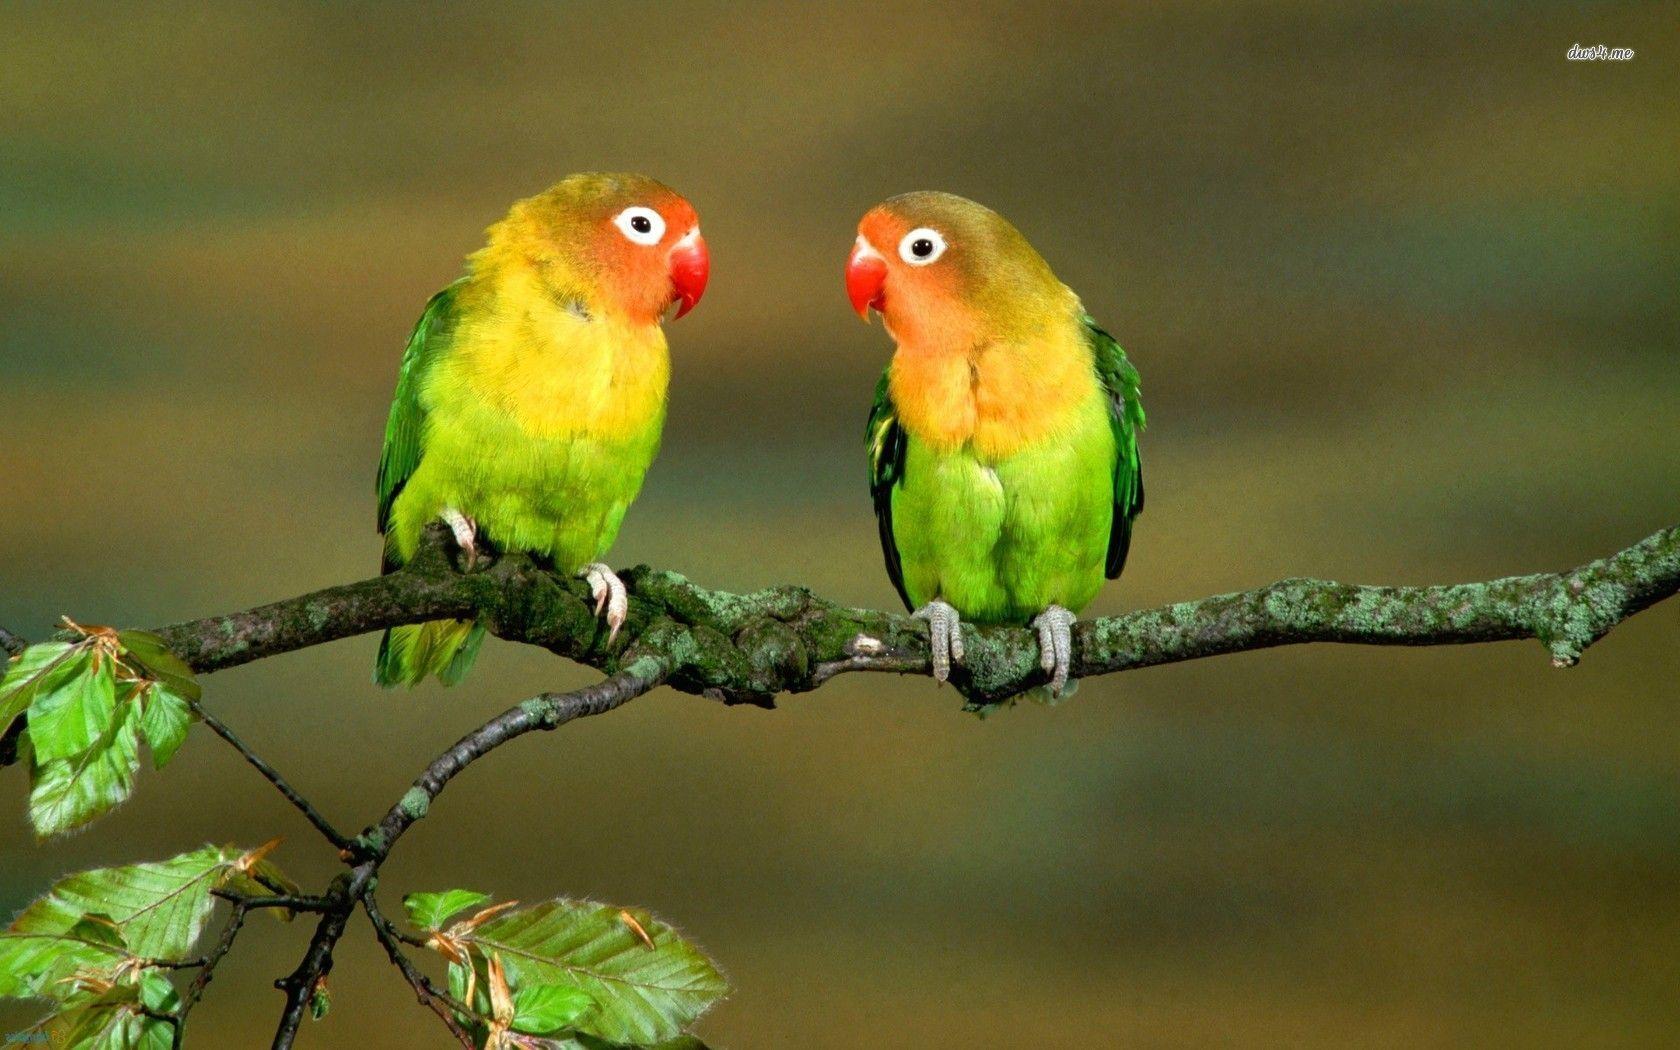 Xs Wallpapers Hd Love Birds Wallpapers: Love Birds Wallpaper Full HD